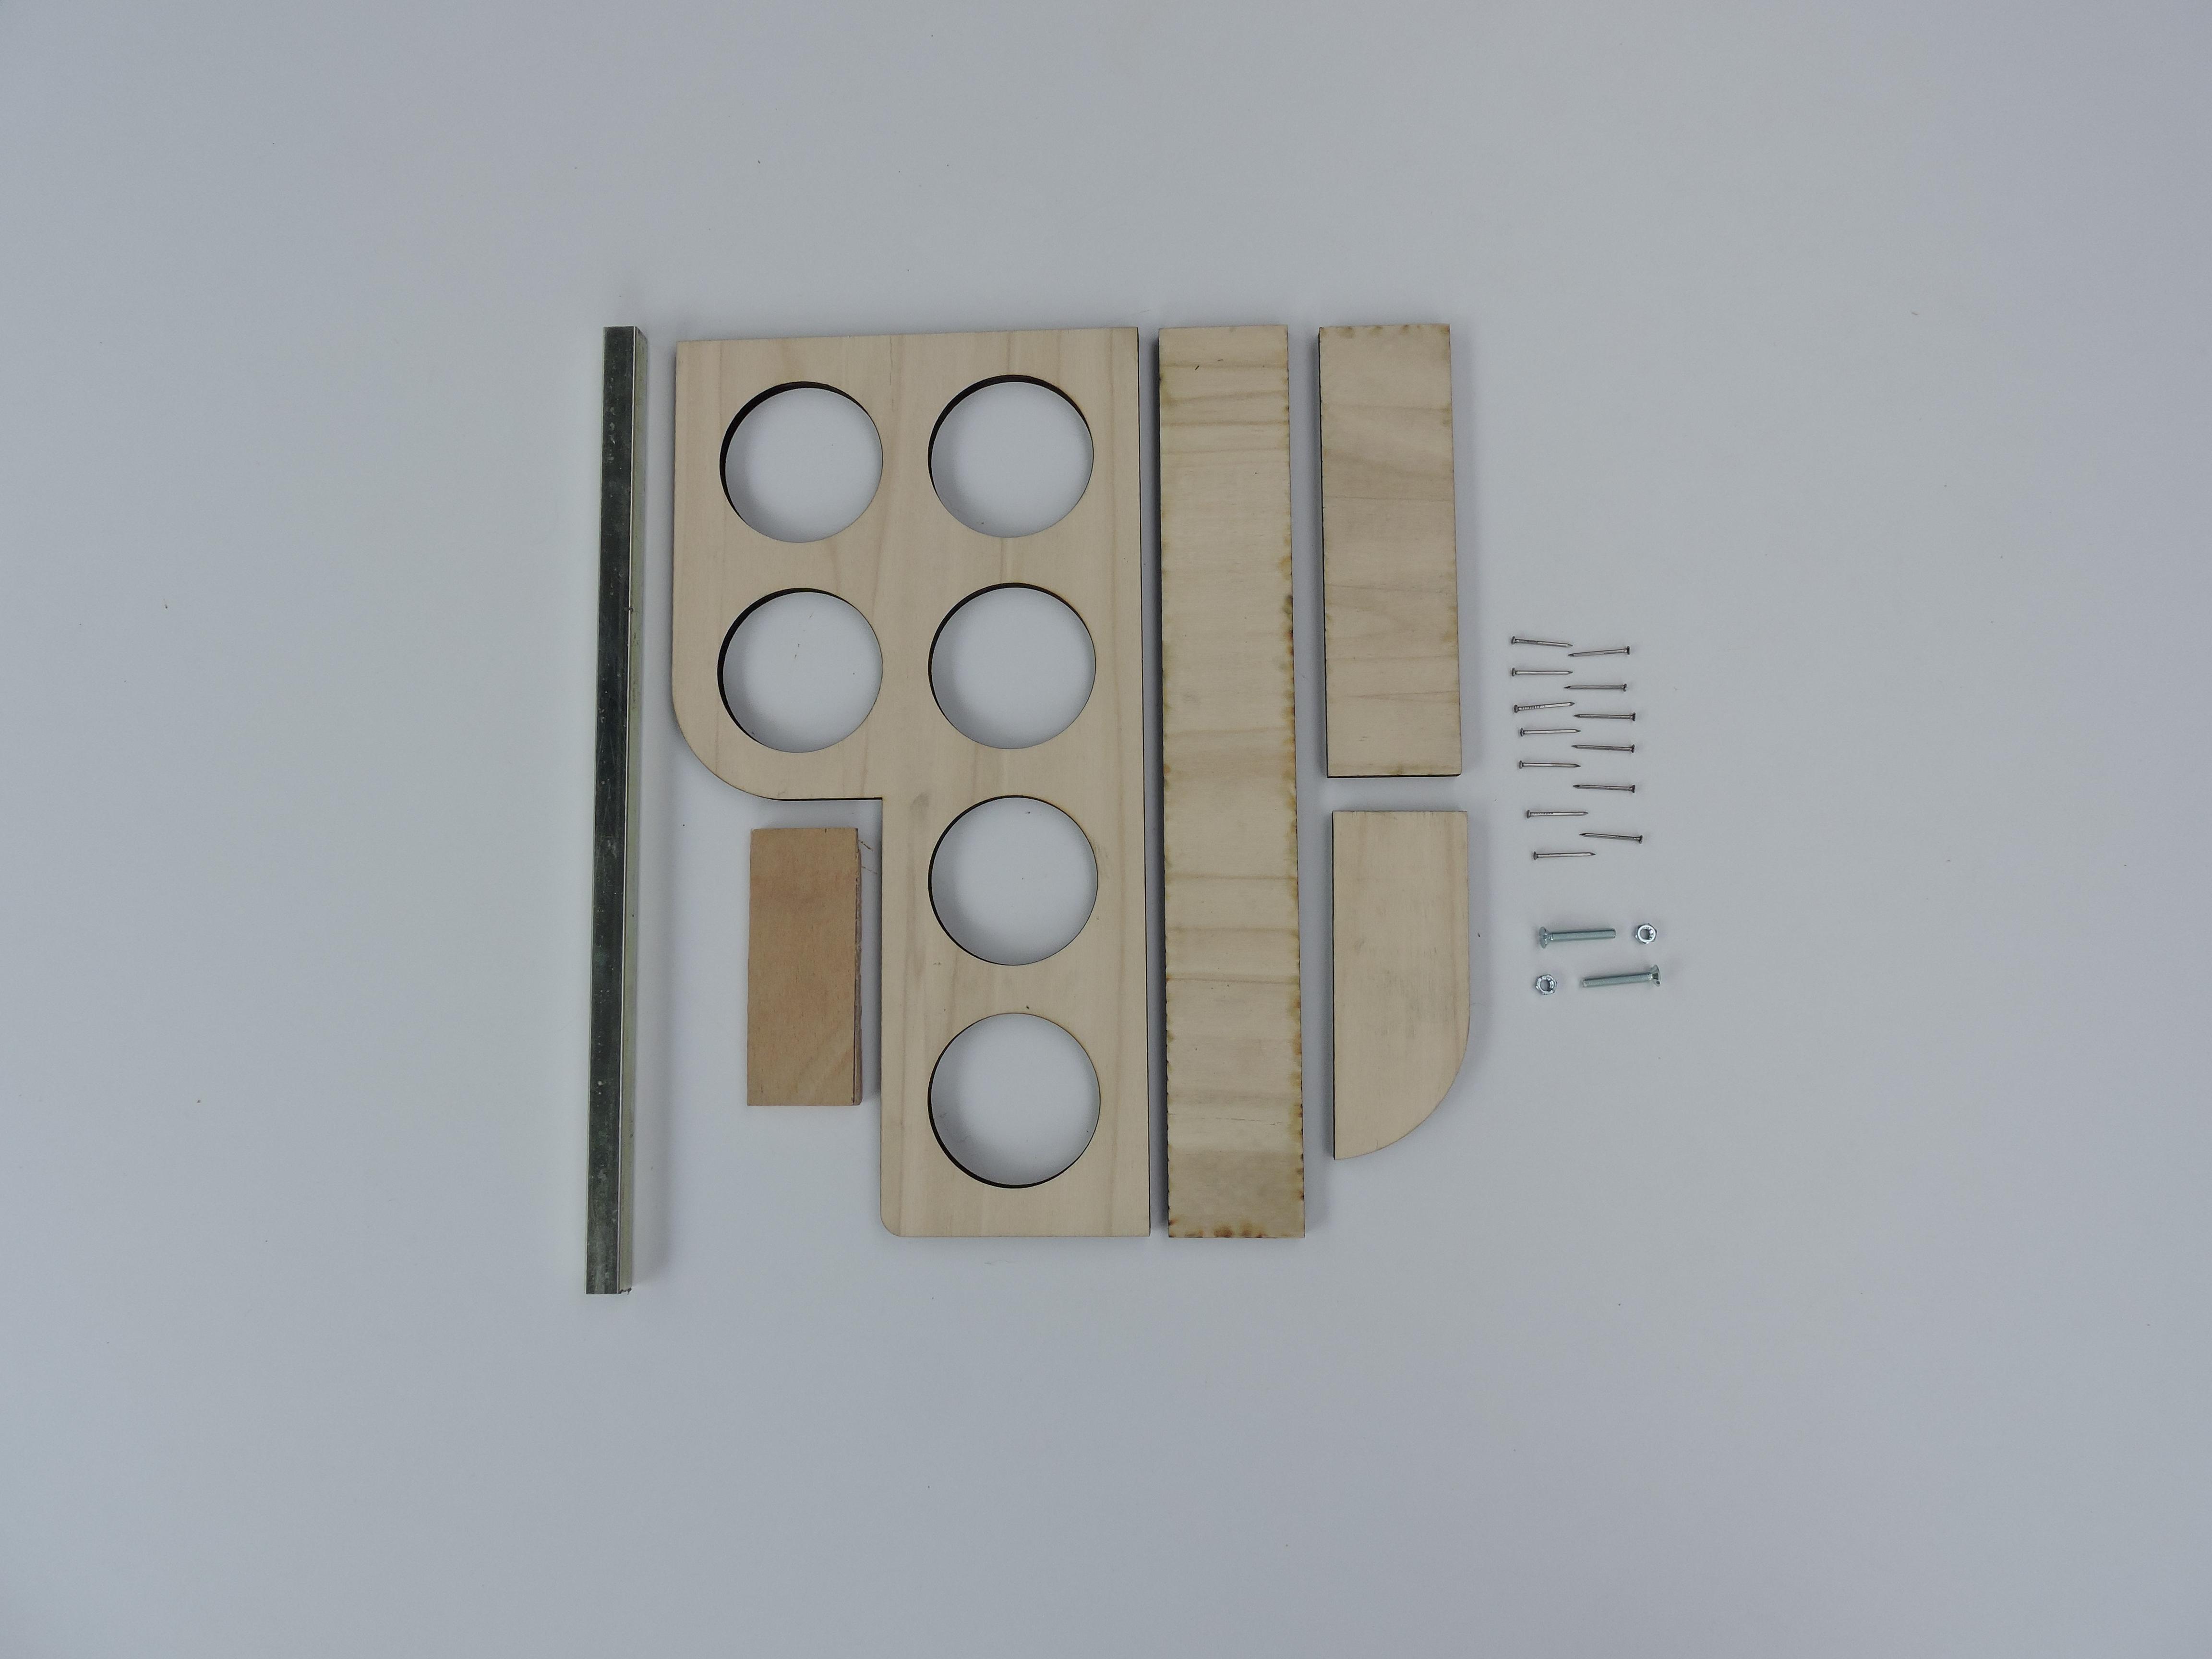 Picture of D4E1 - DIY - Assistive Technology - Boccia Aid